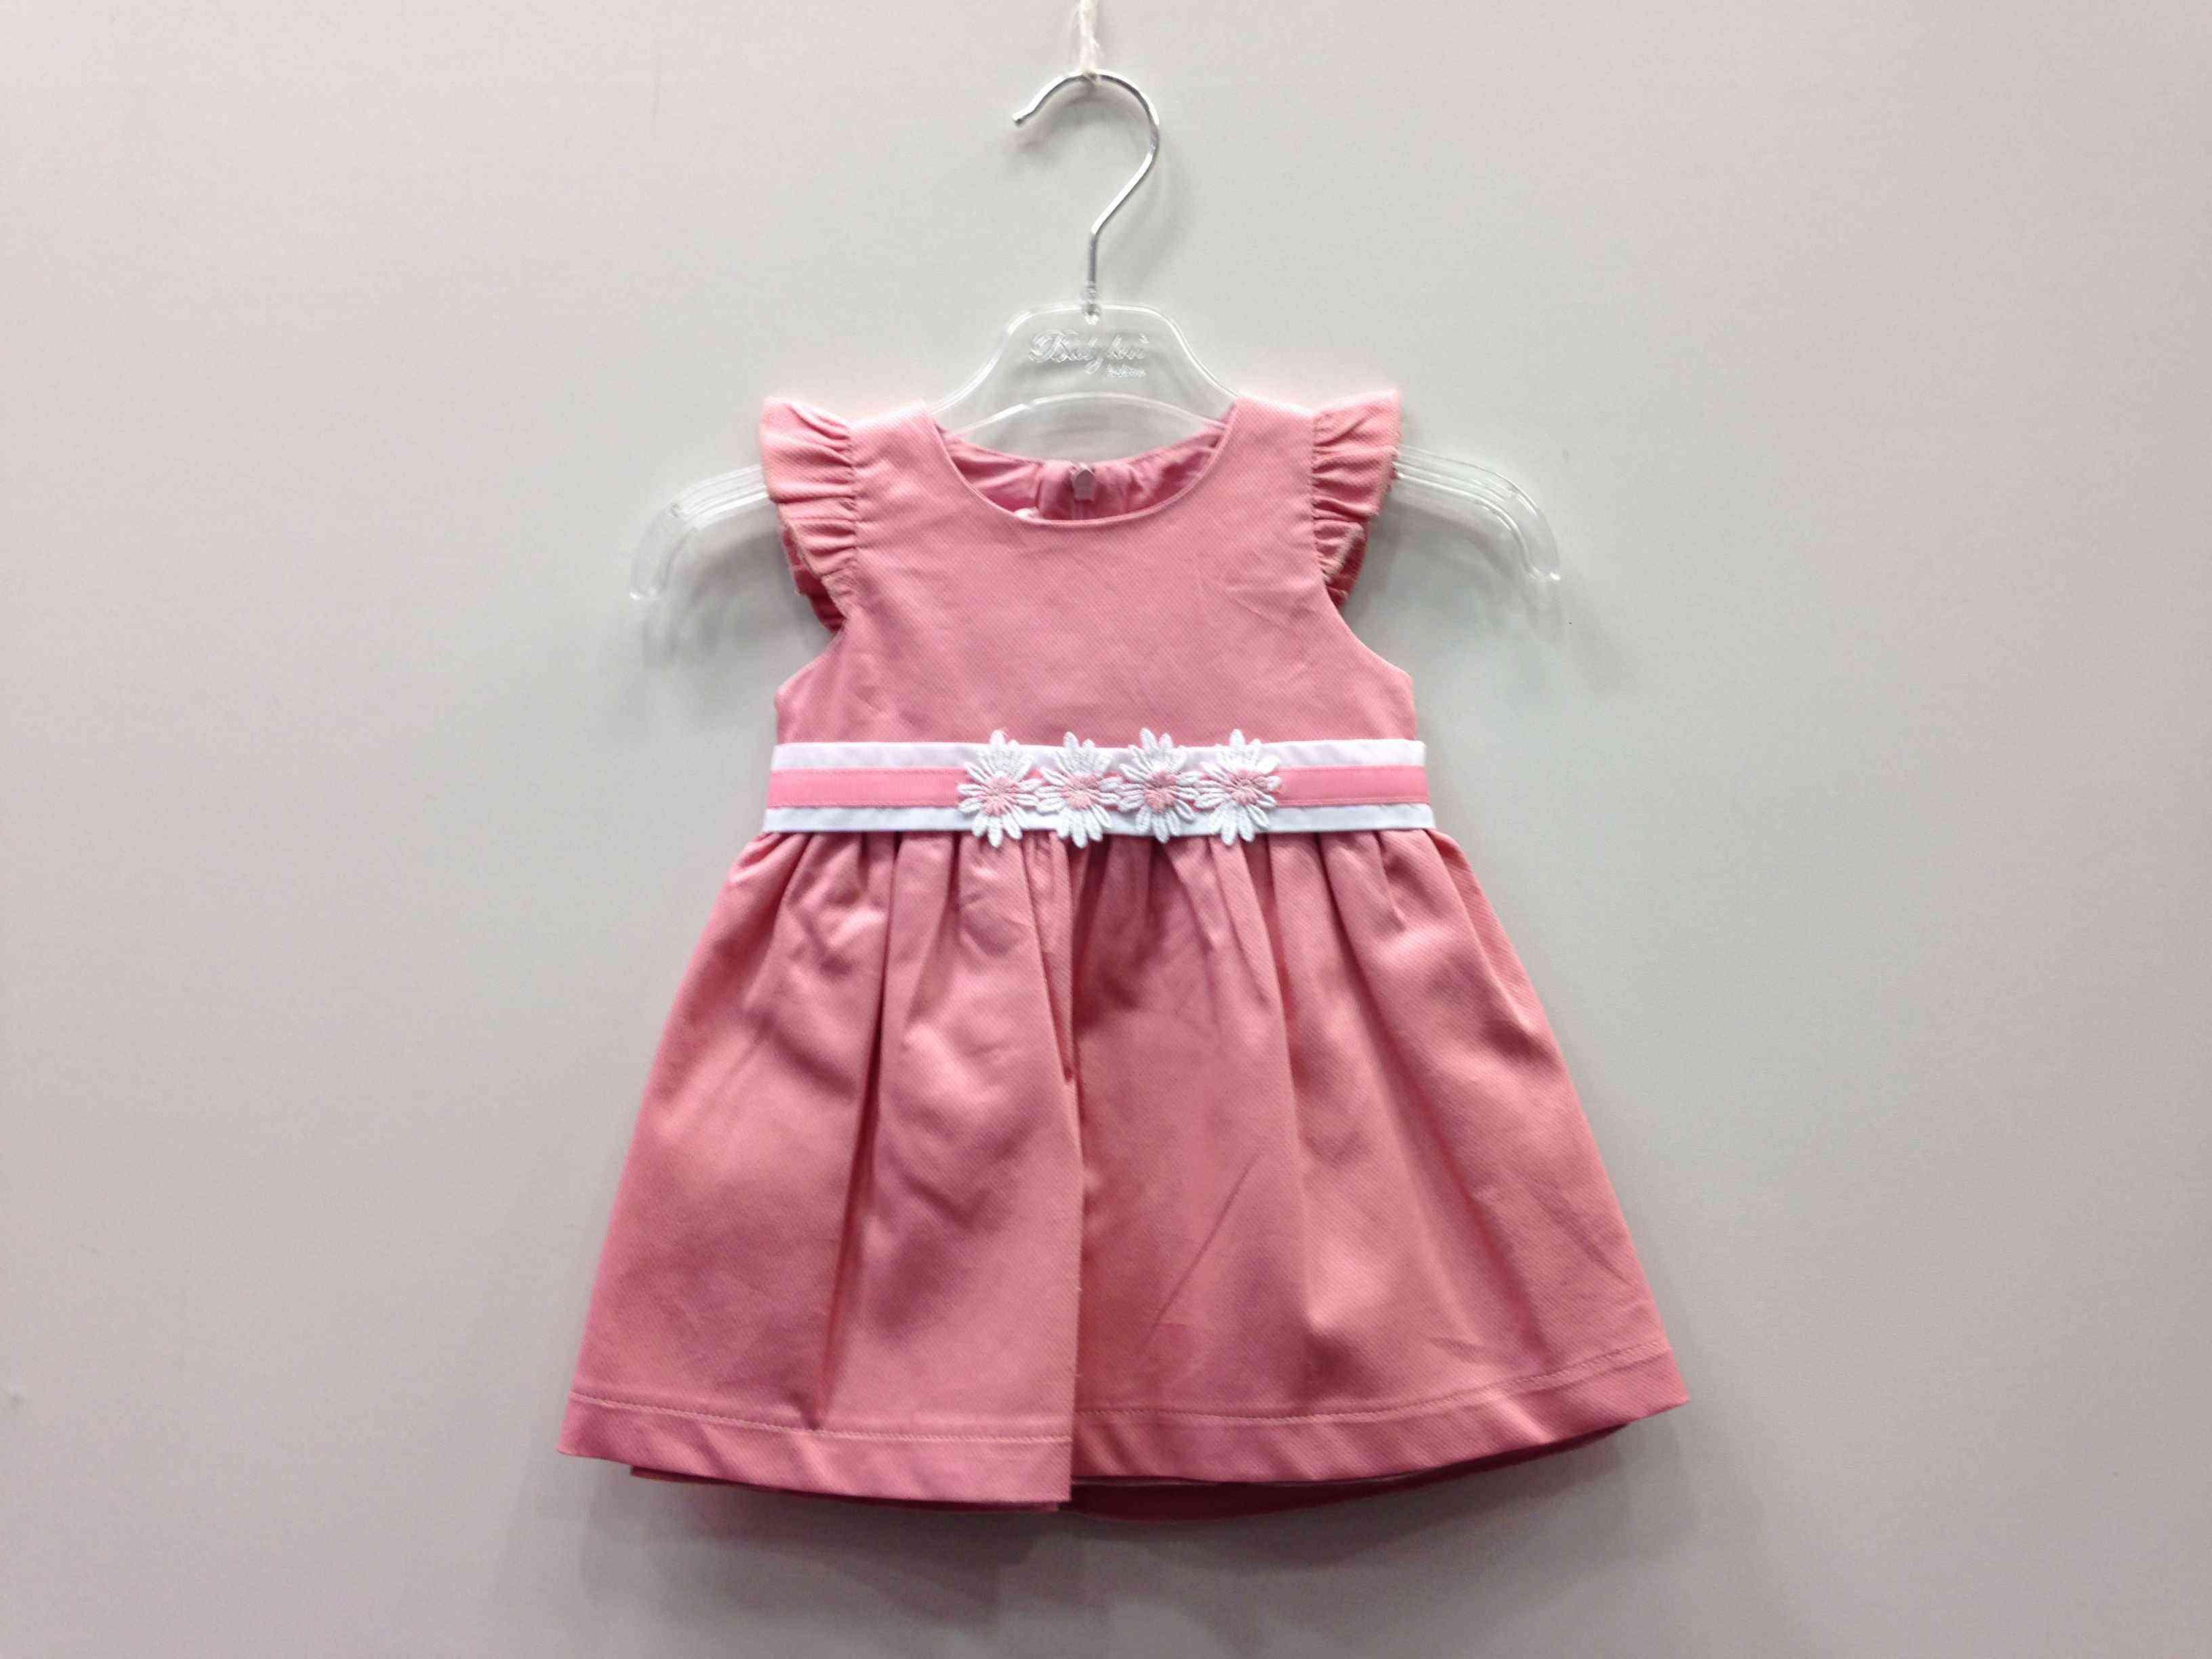 5809efcf58b BABYLON φόρεμα με ζώνη στη μέση, με λουλούδια 3D -